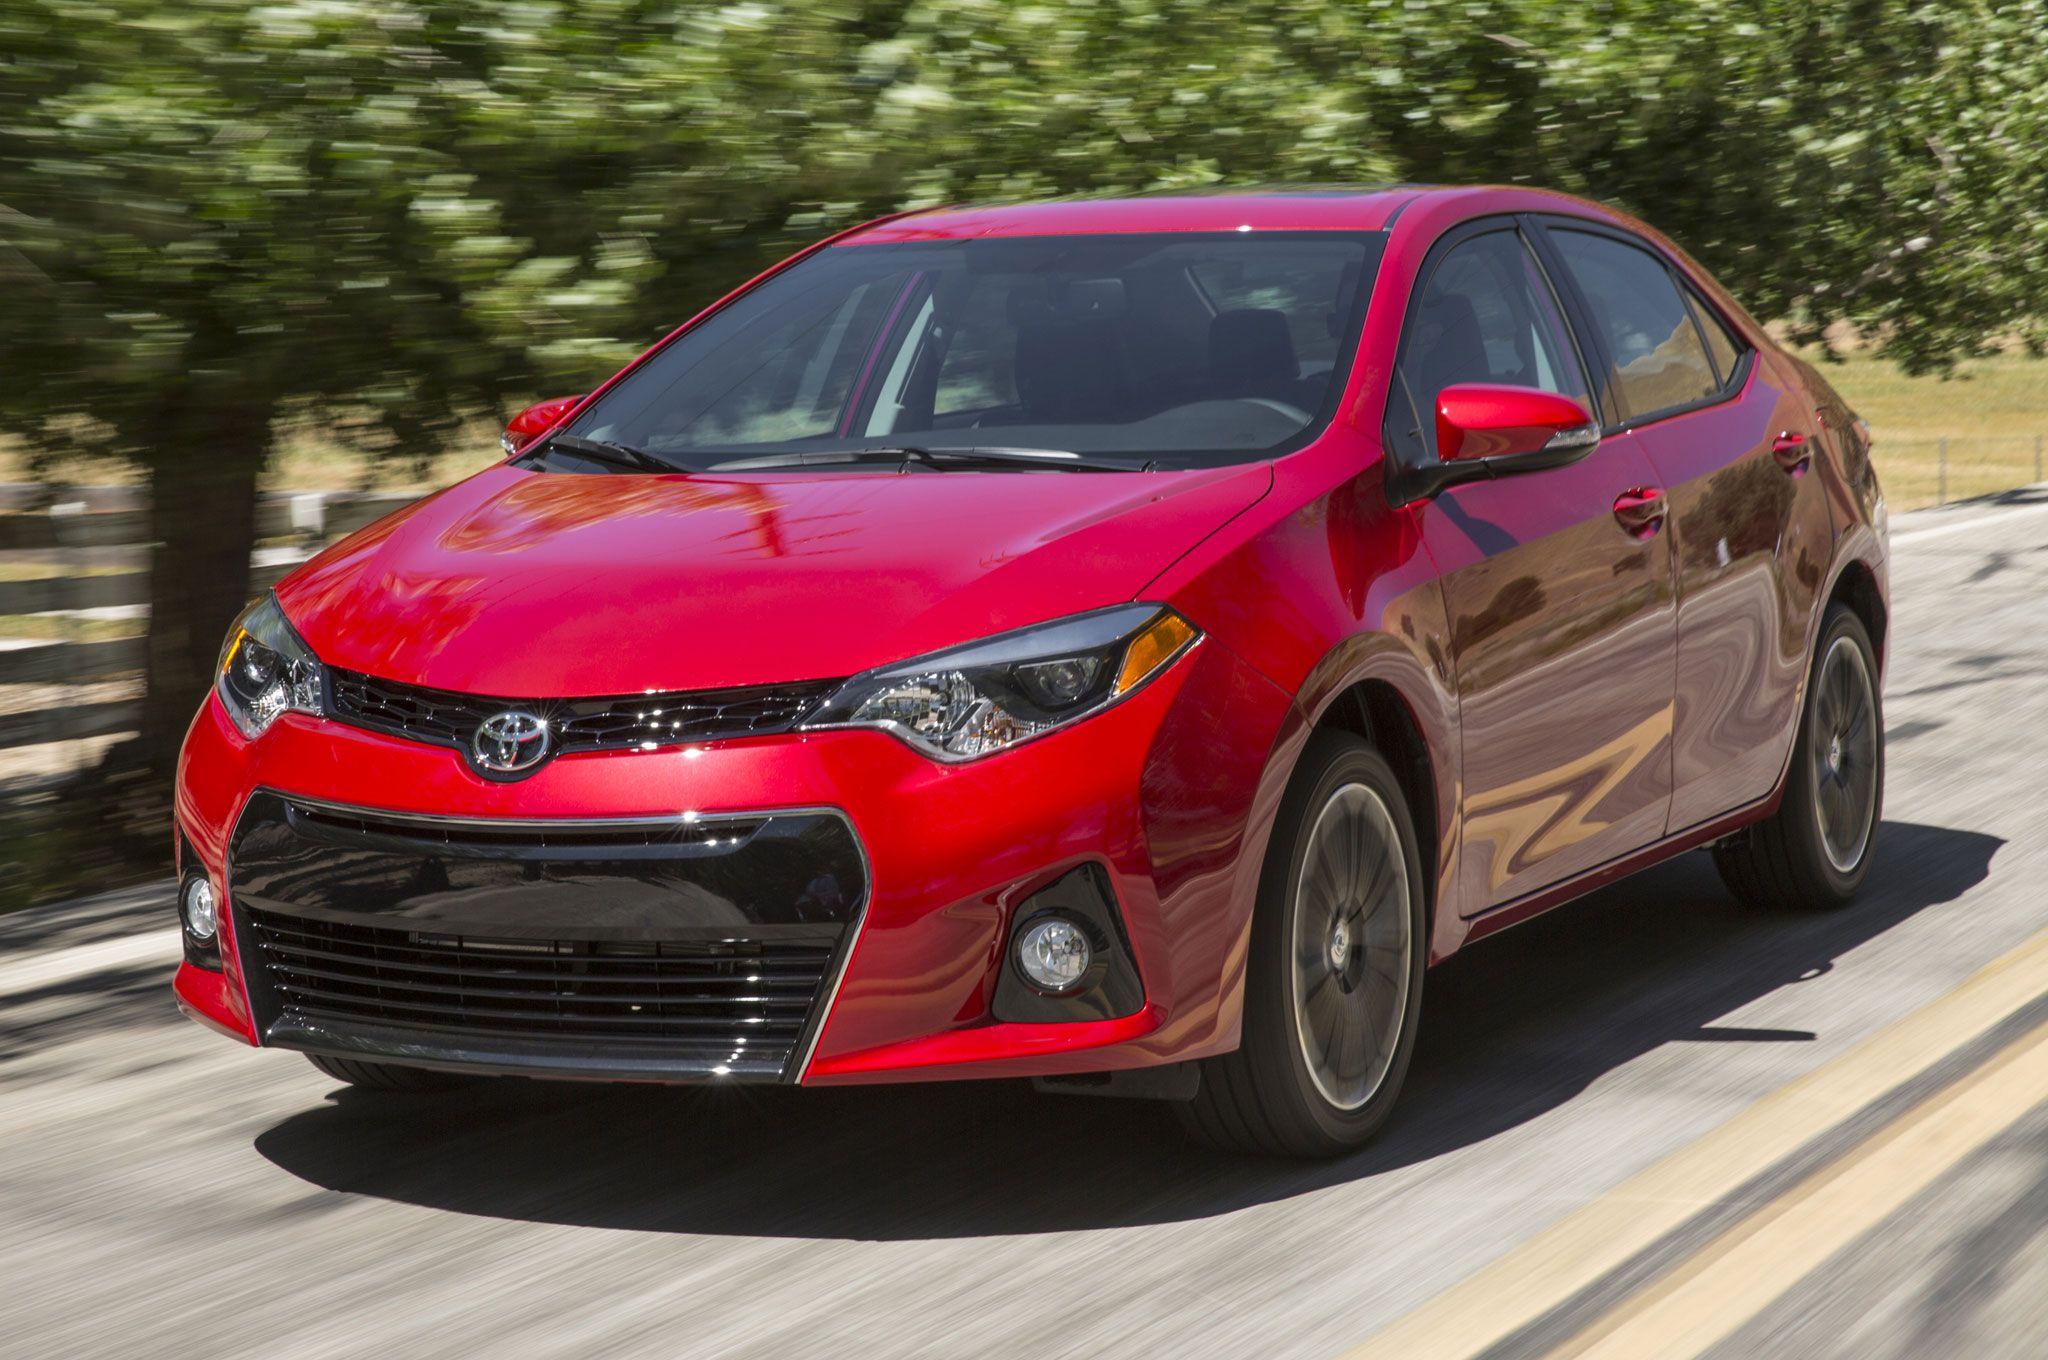 Toyota Corolla Mpg >> 2014 Toyota Corolla 2014 Toyota Corolla Consumer Reviews